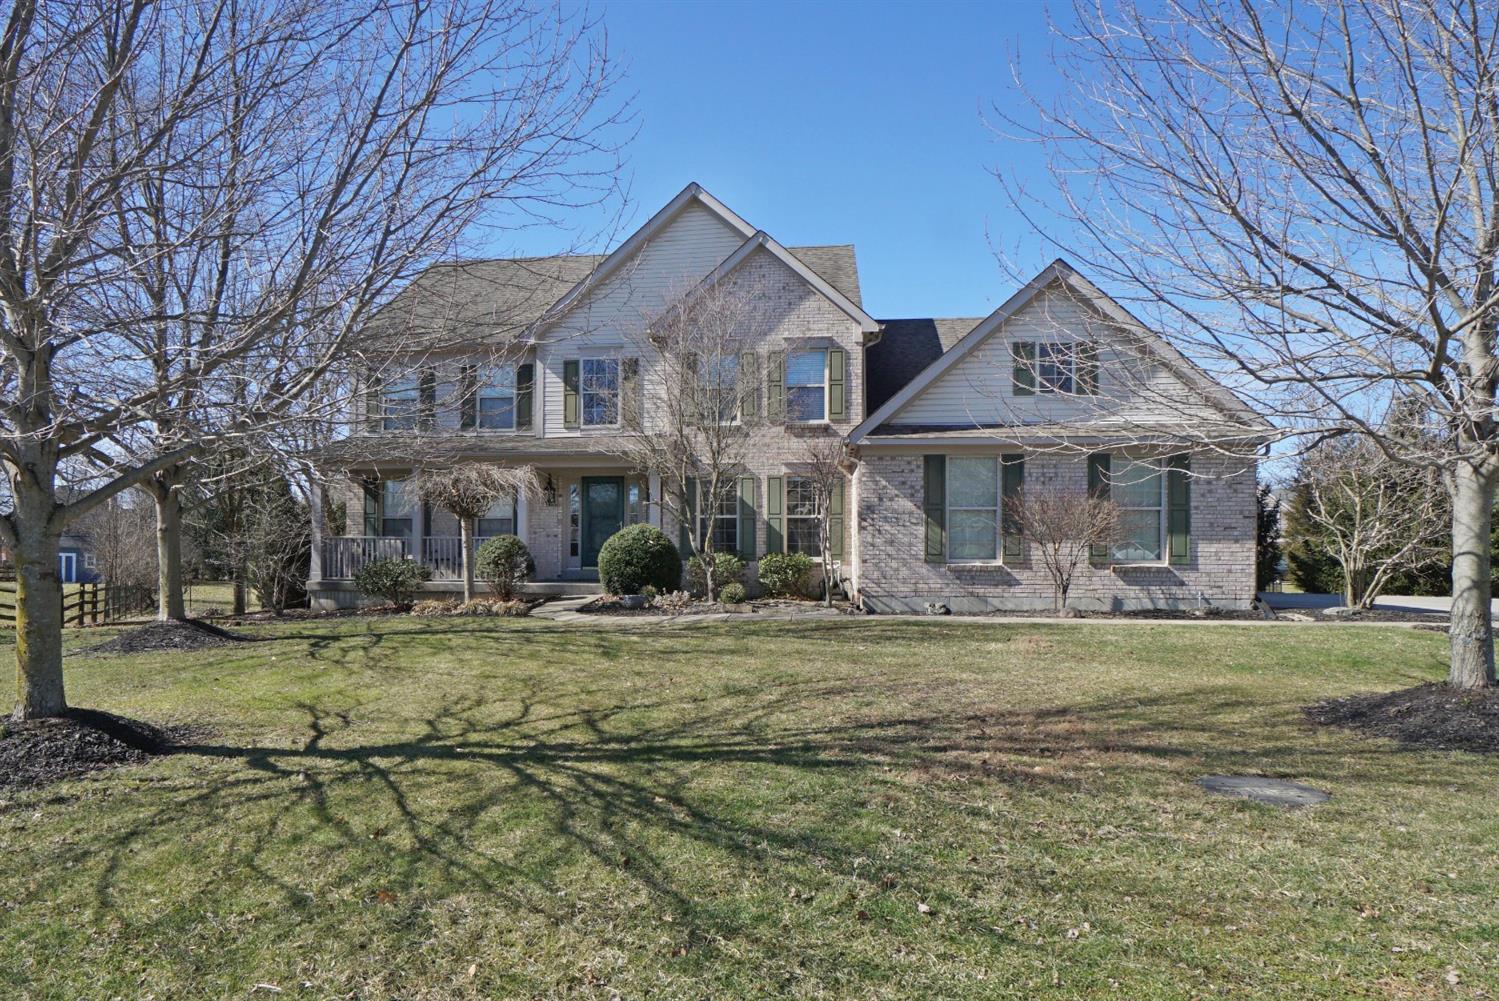 Property for sale at 1155 Cheltenham Place, Hamilton Twp,  Ohio 45039